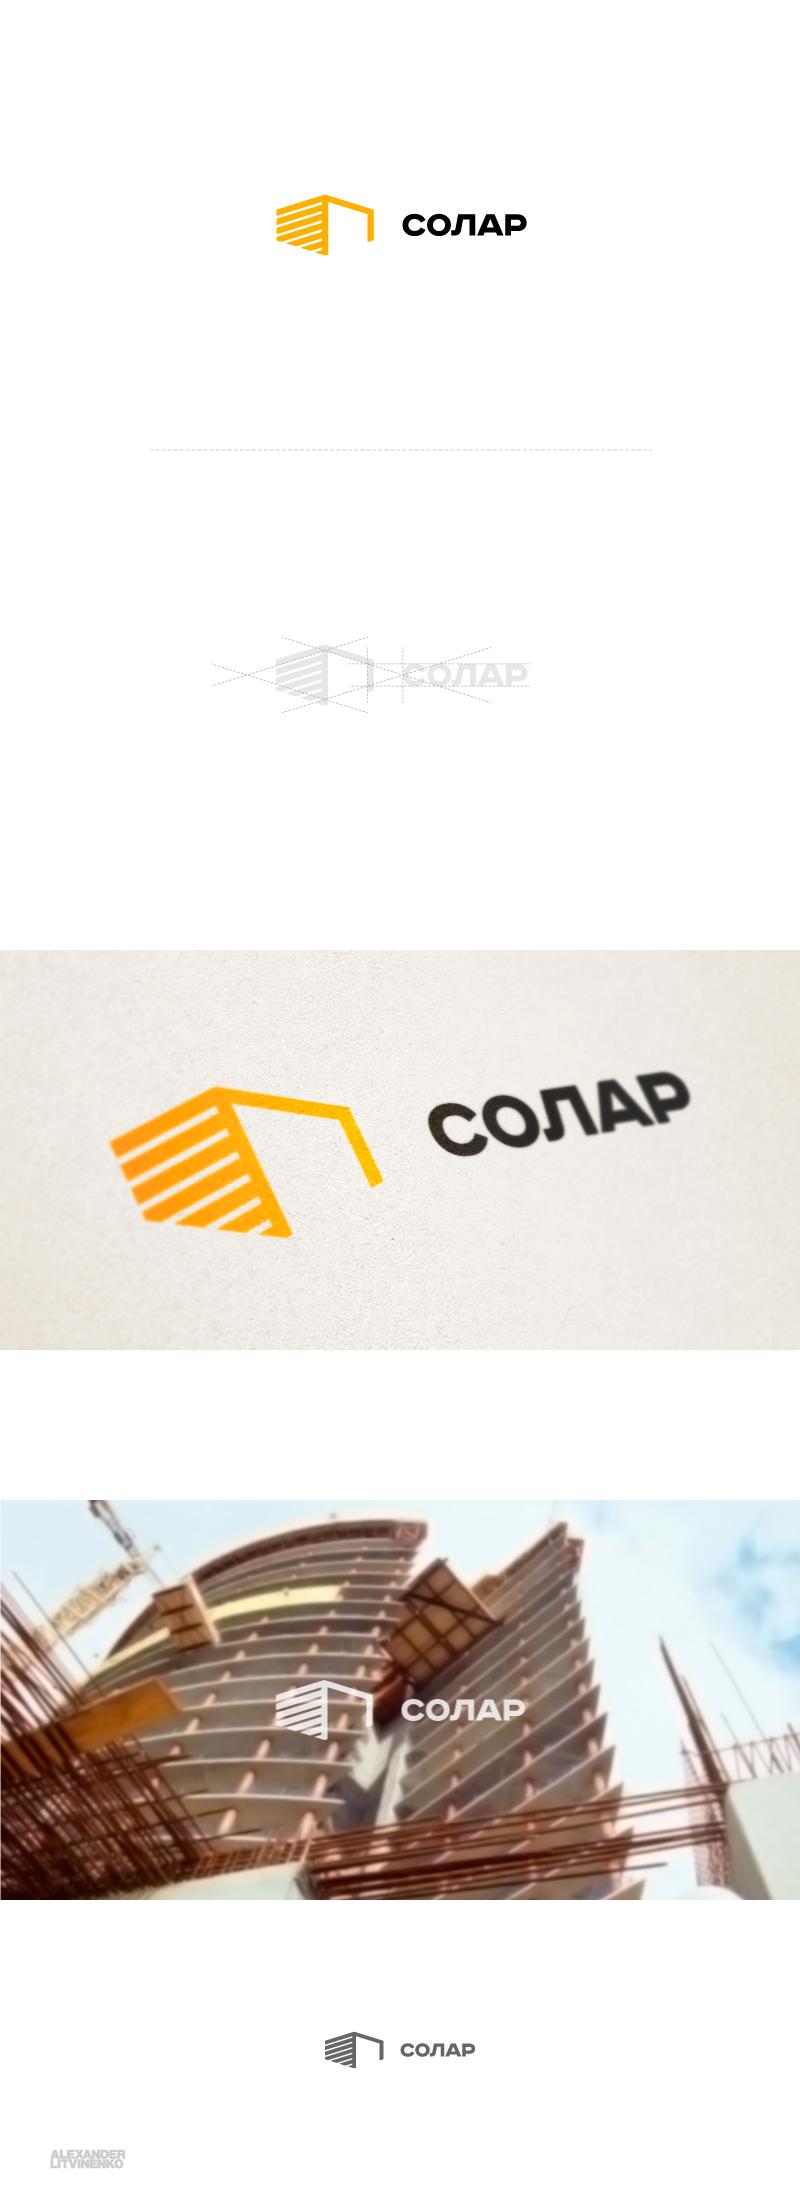 Солар. Логотип © Александр Литвиненко